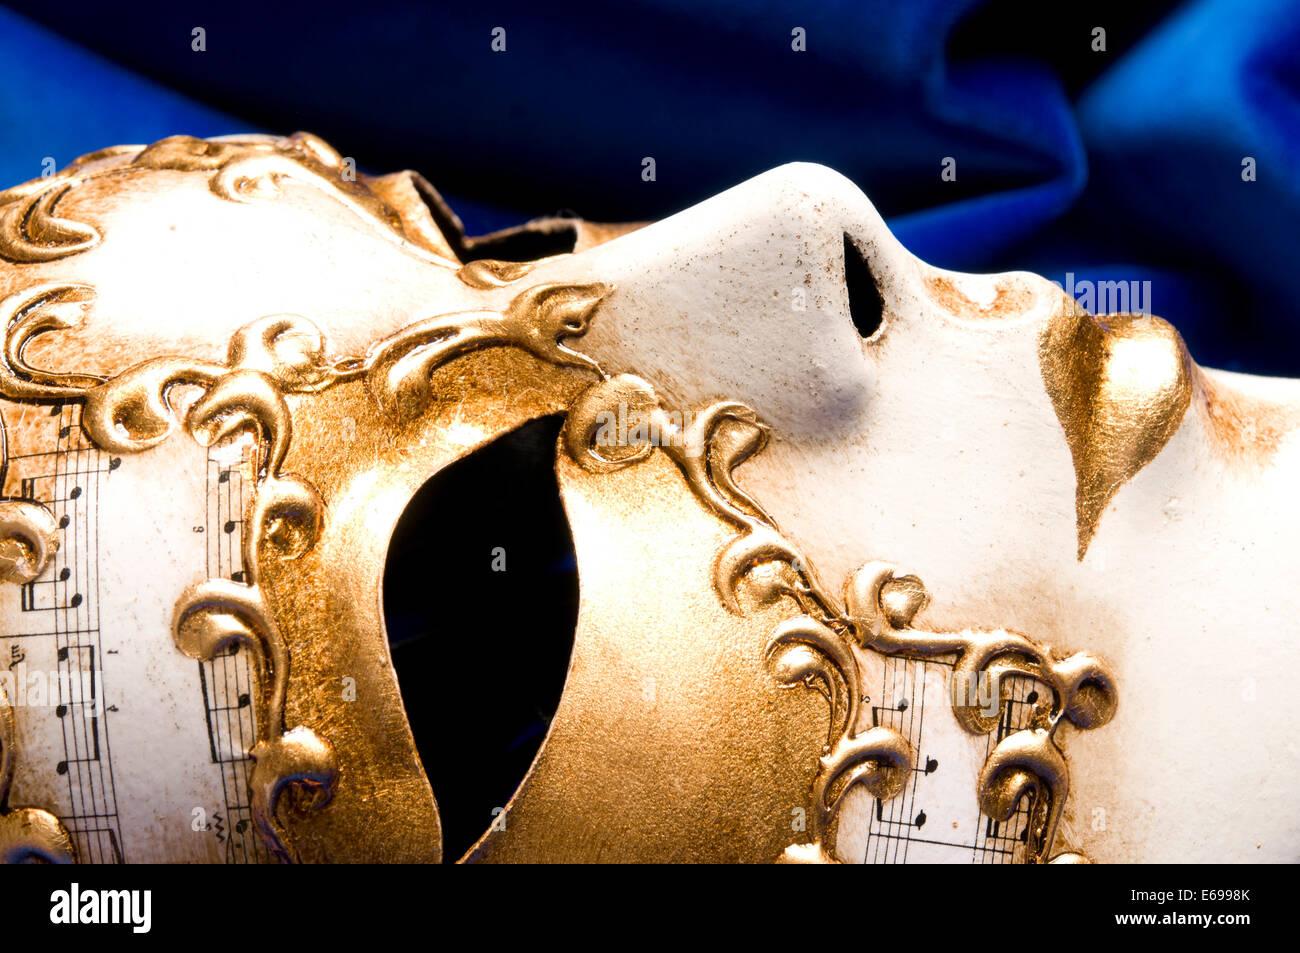 Venetian carnival mask - Stock Image